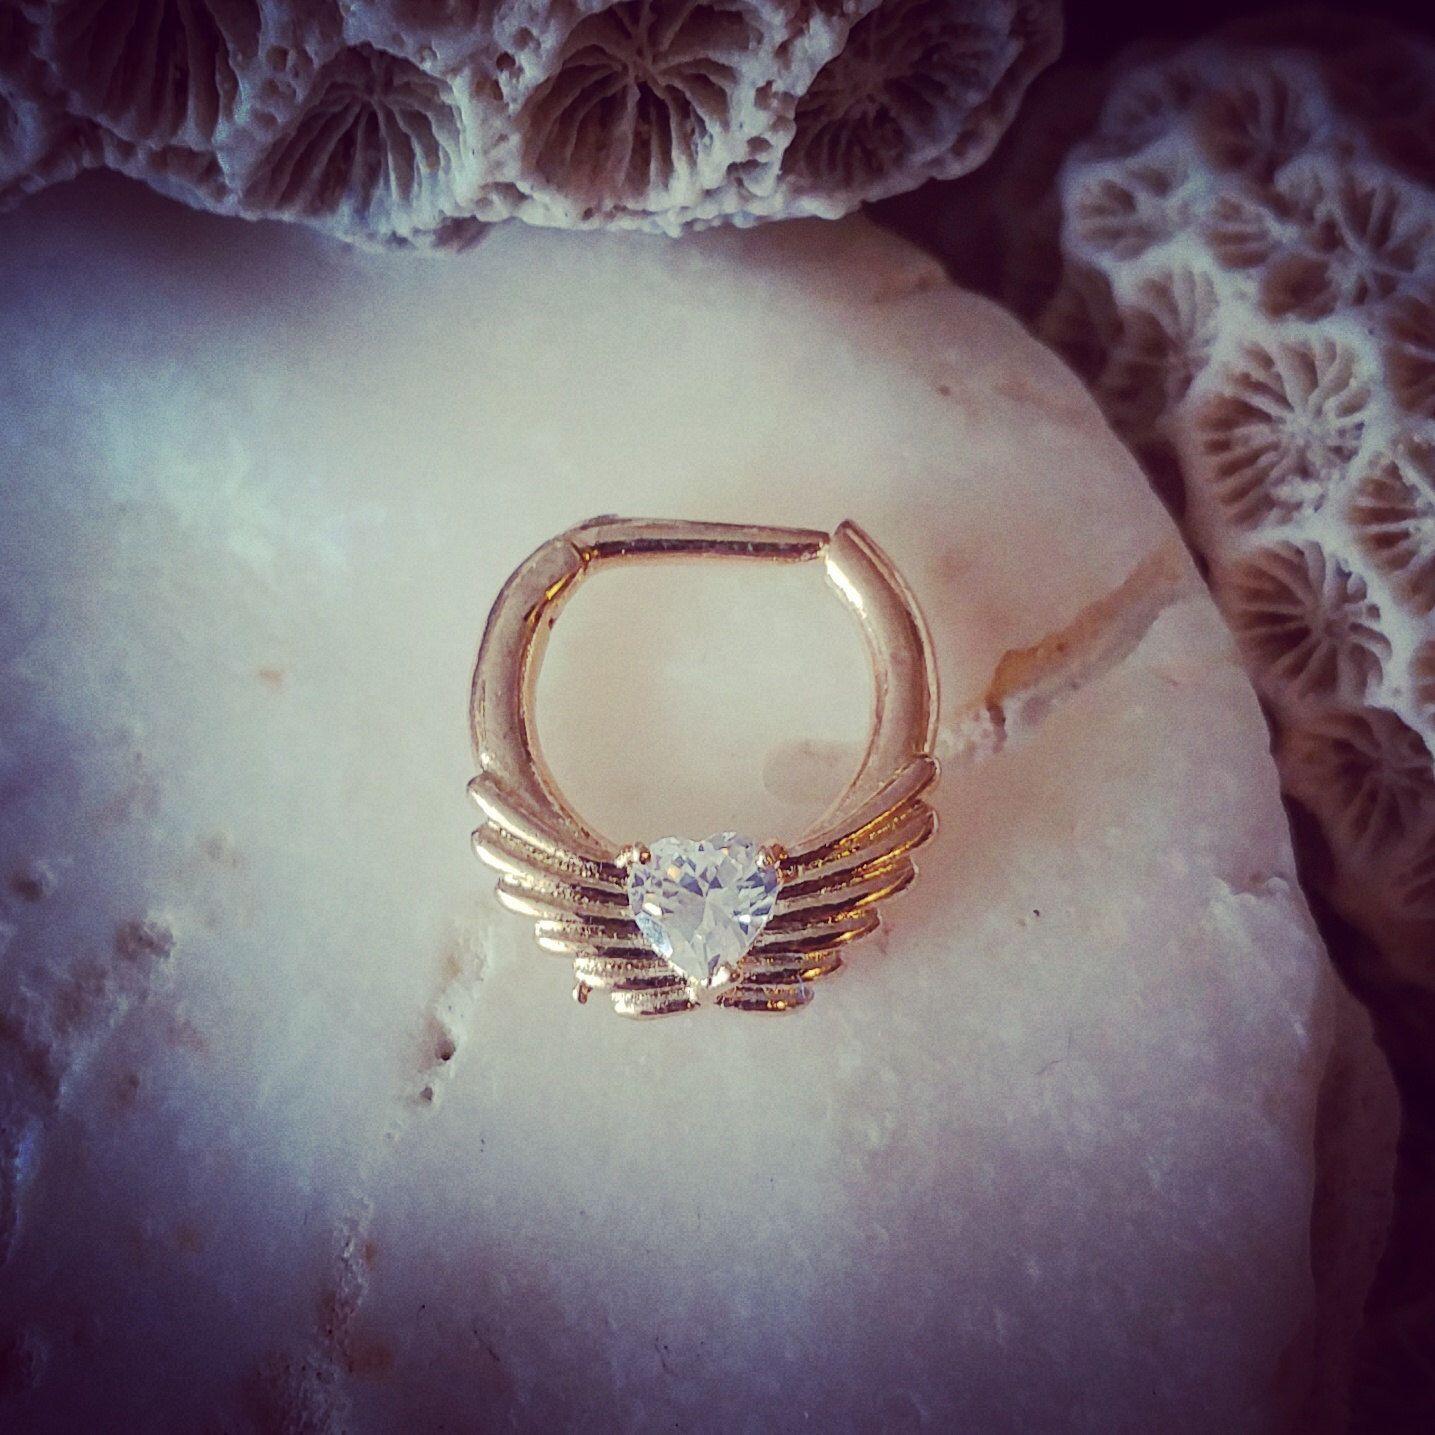 Crystal Heart Gold Septum Clicker 16G | Hinged Septum Ring Wings ...